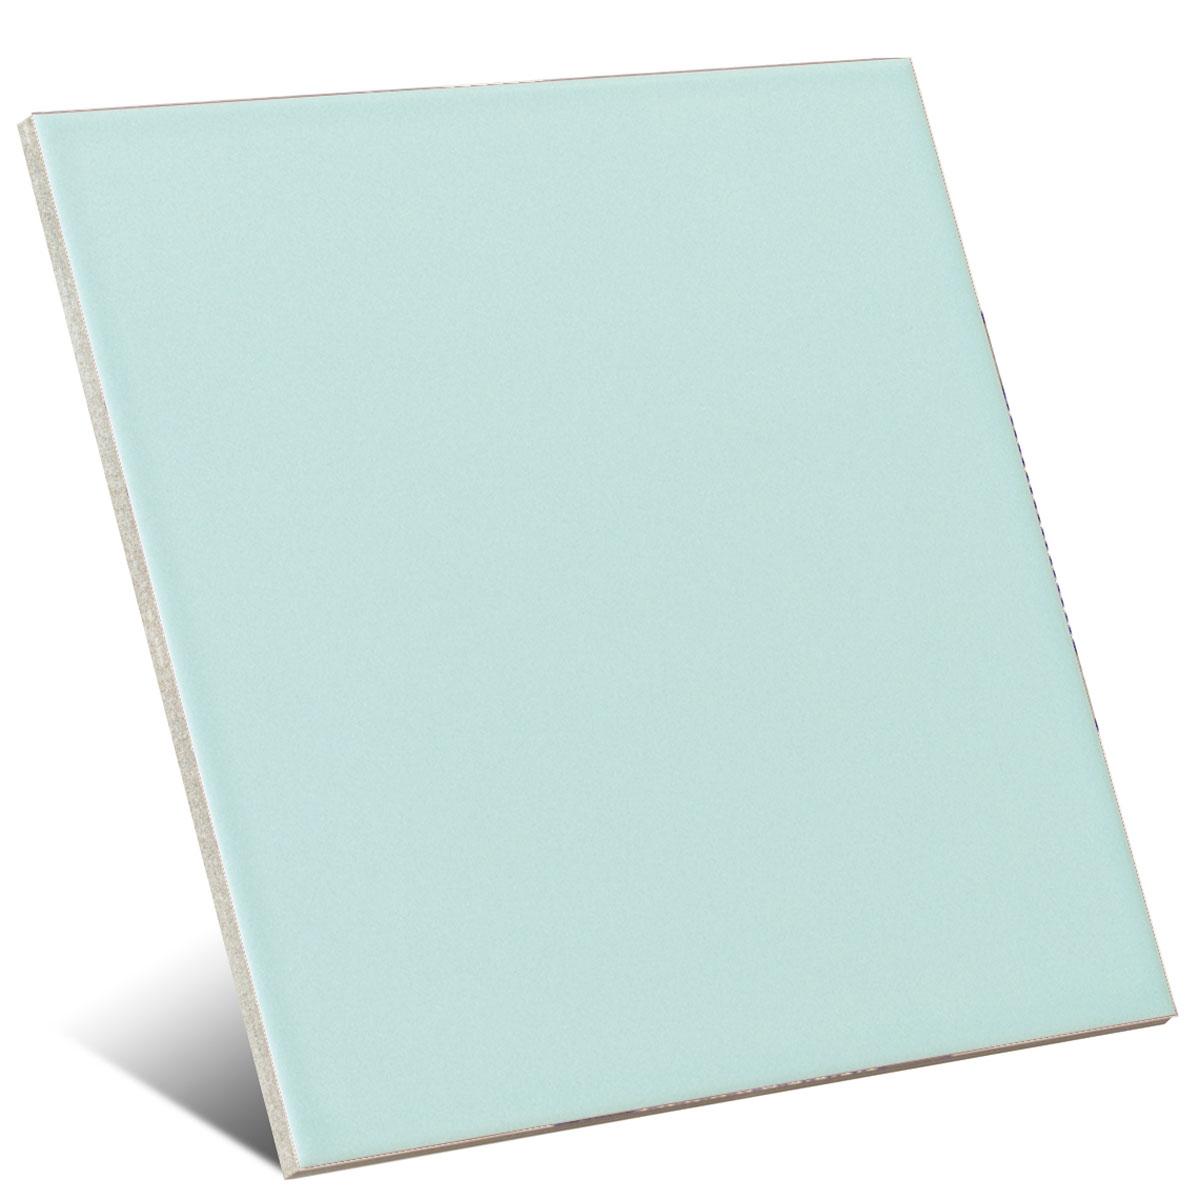 Color turquesa mate 20x20 cm (caja 1 m2)